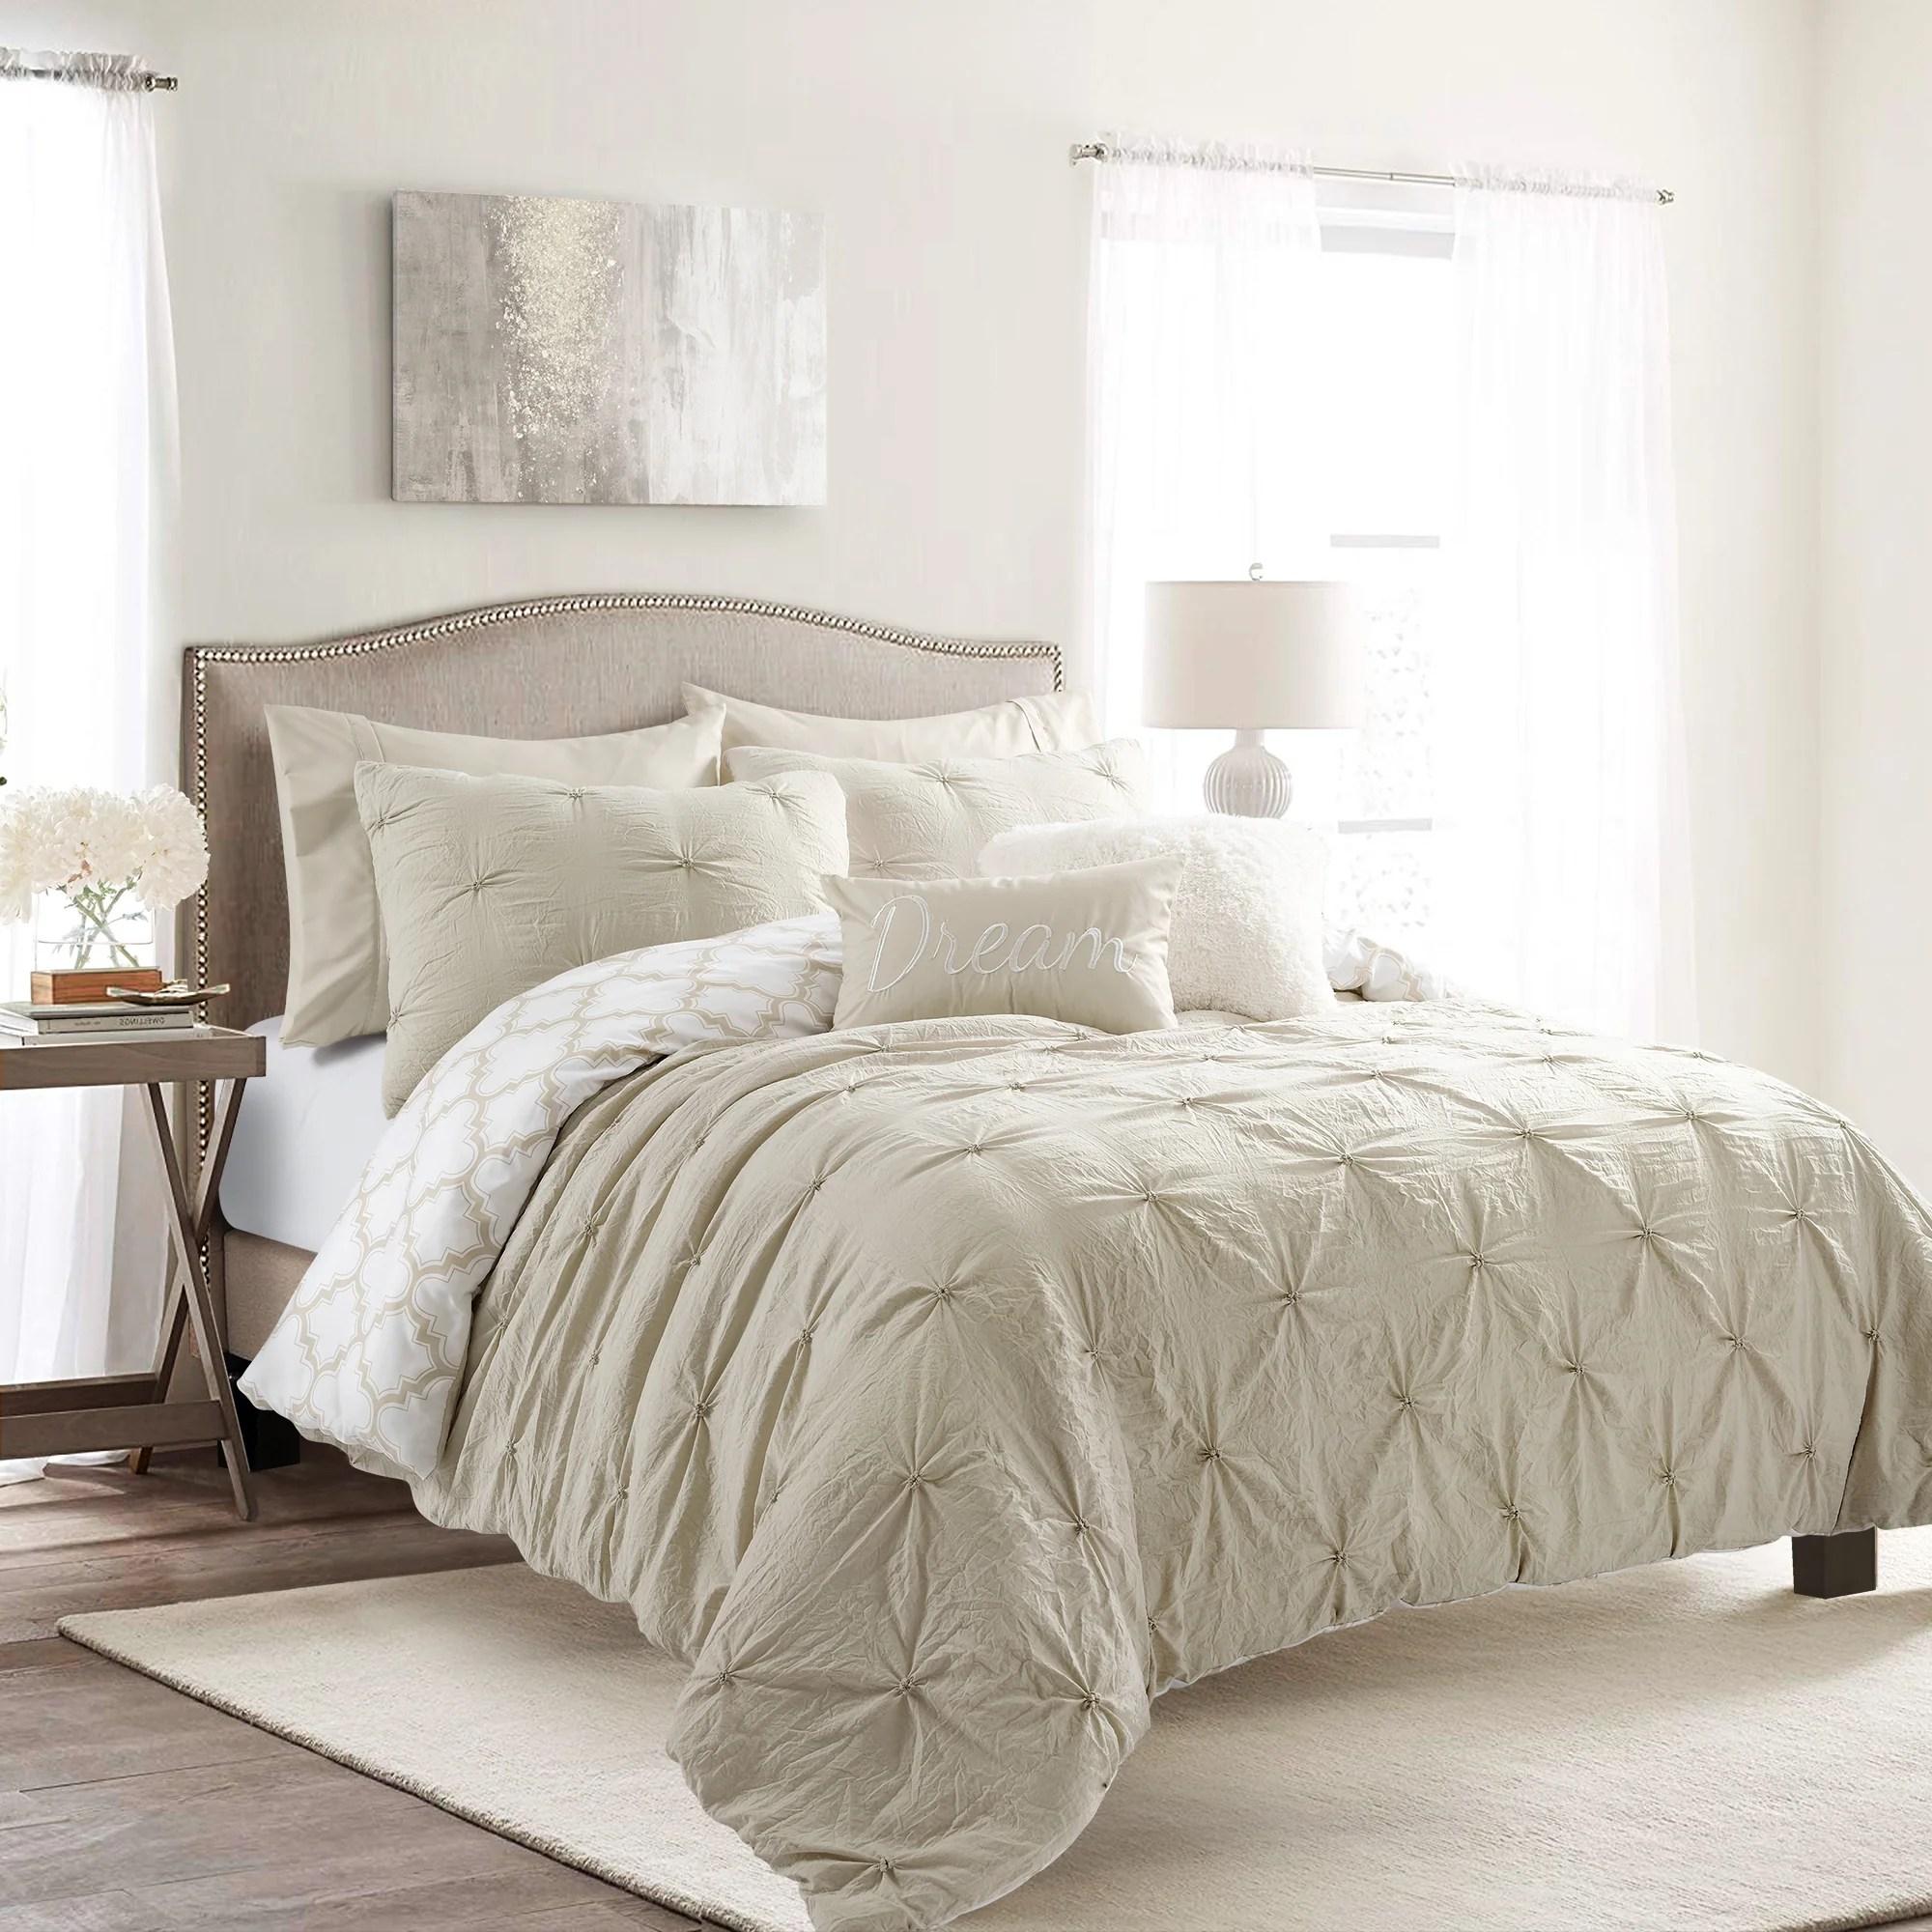 ravello pintuck caroline geo 7 piece comforter set full queen neutral